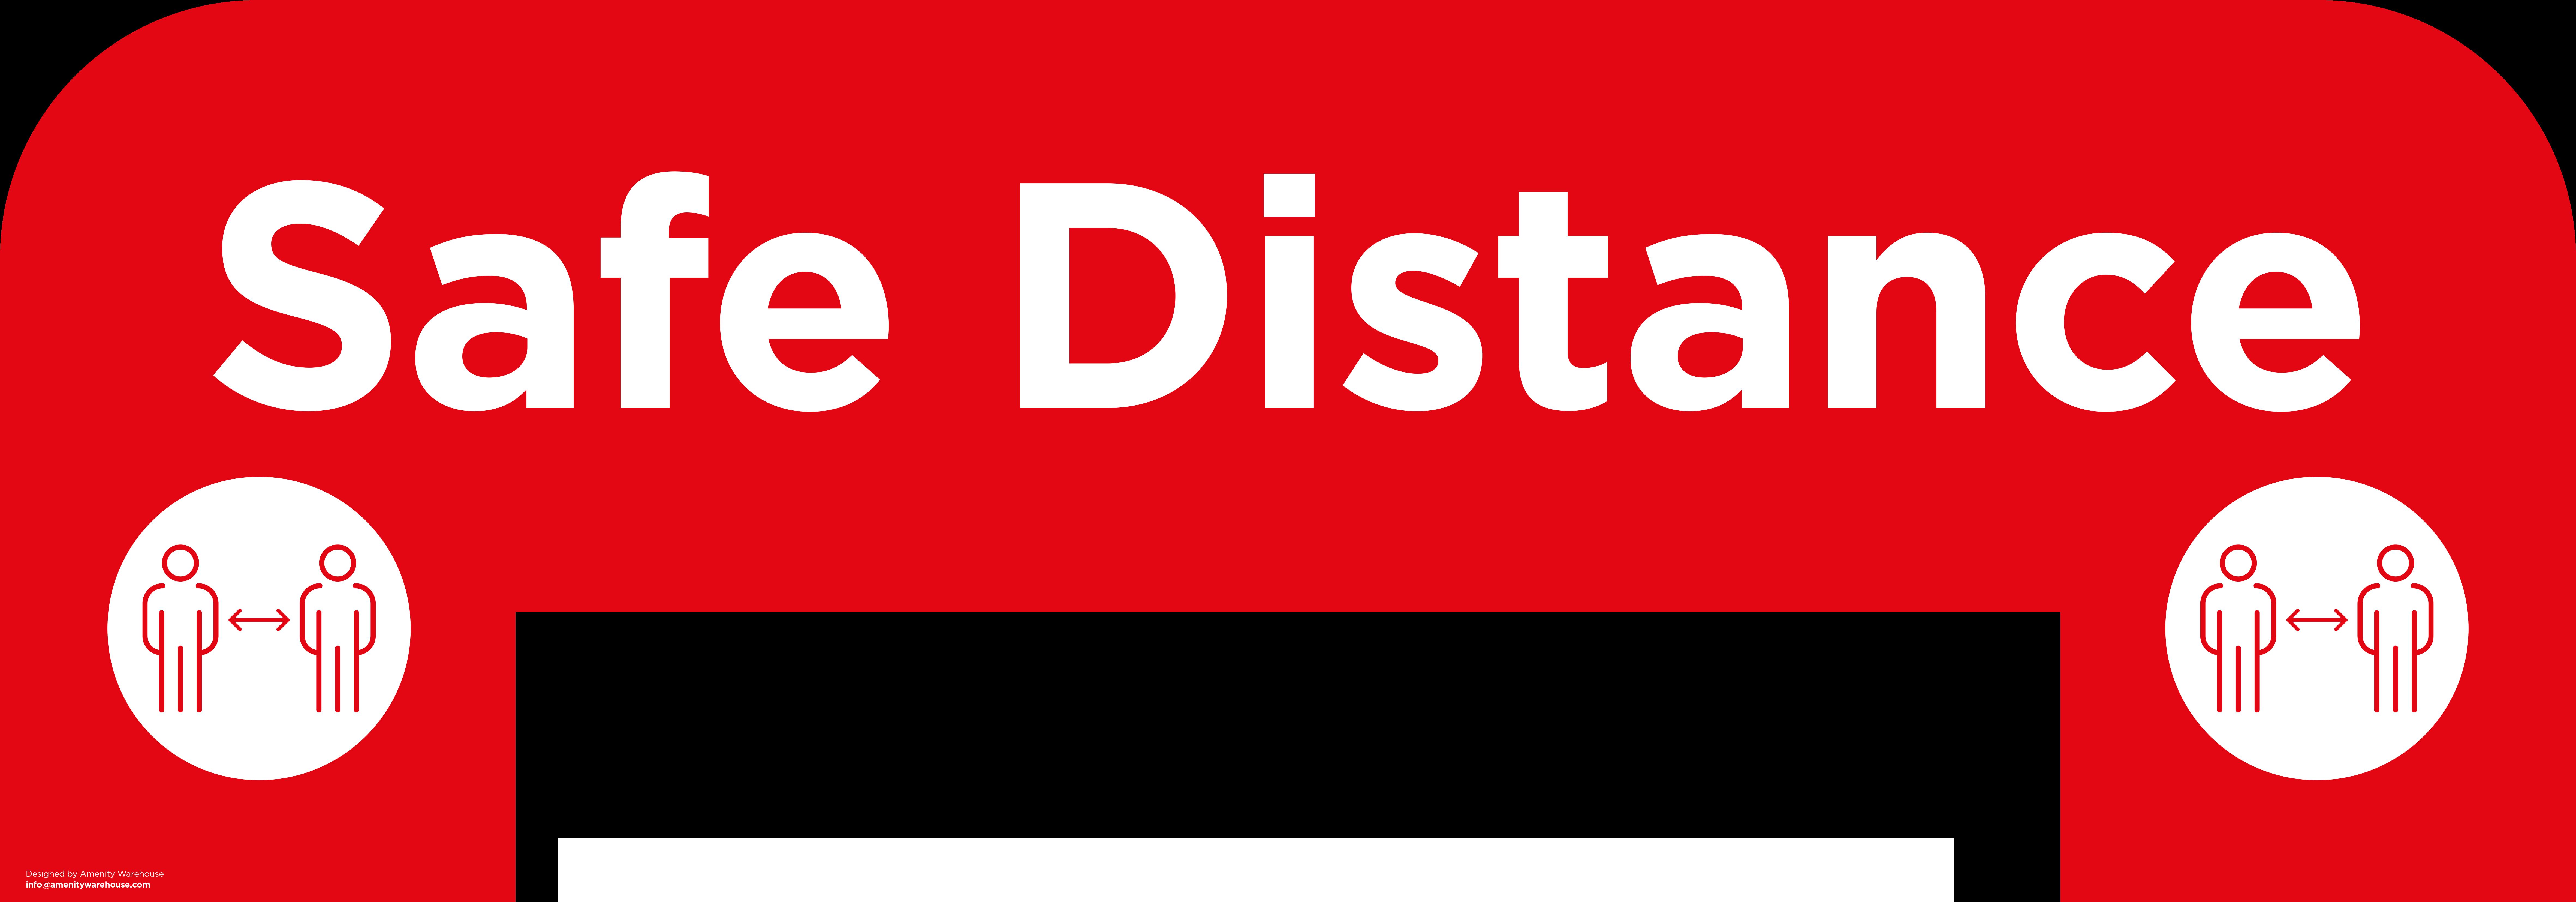 Please-Keep-Safe-Distance-800x280-AW-1